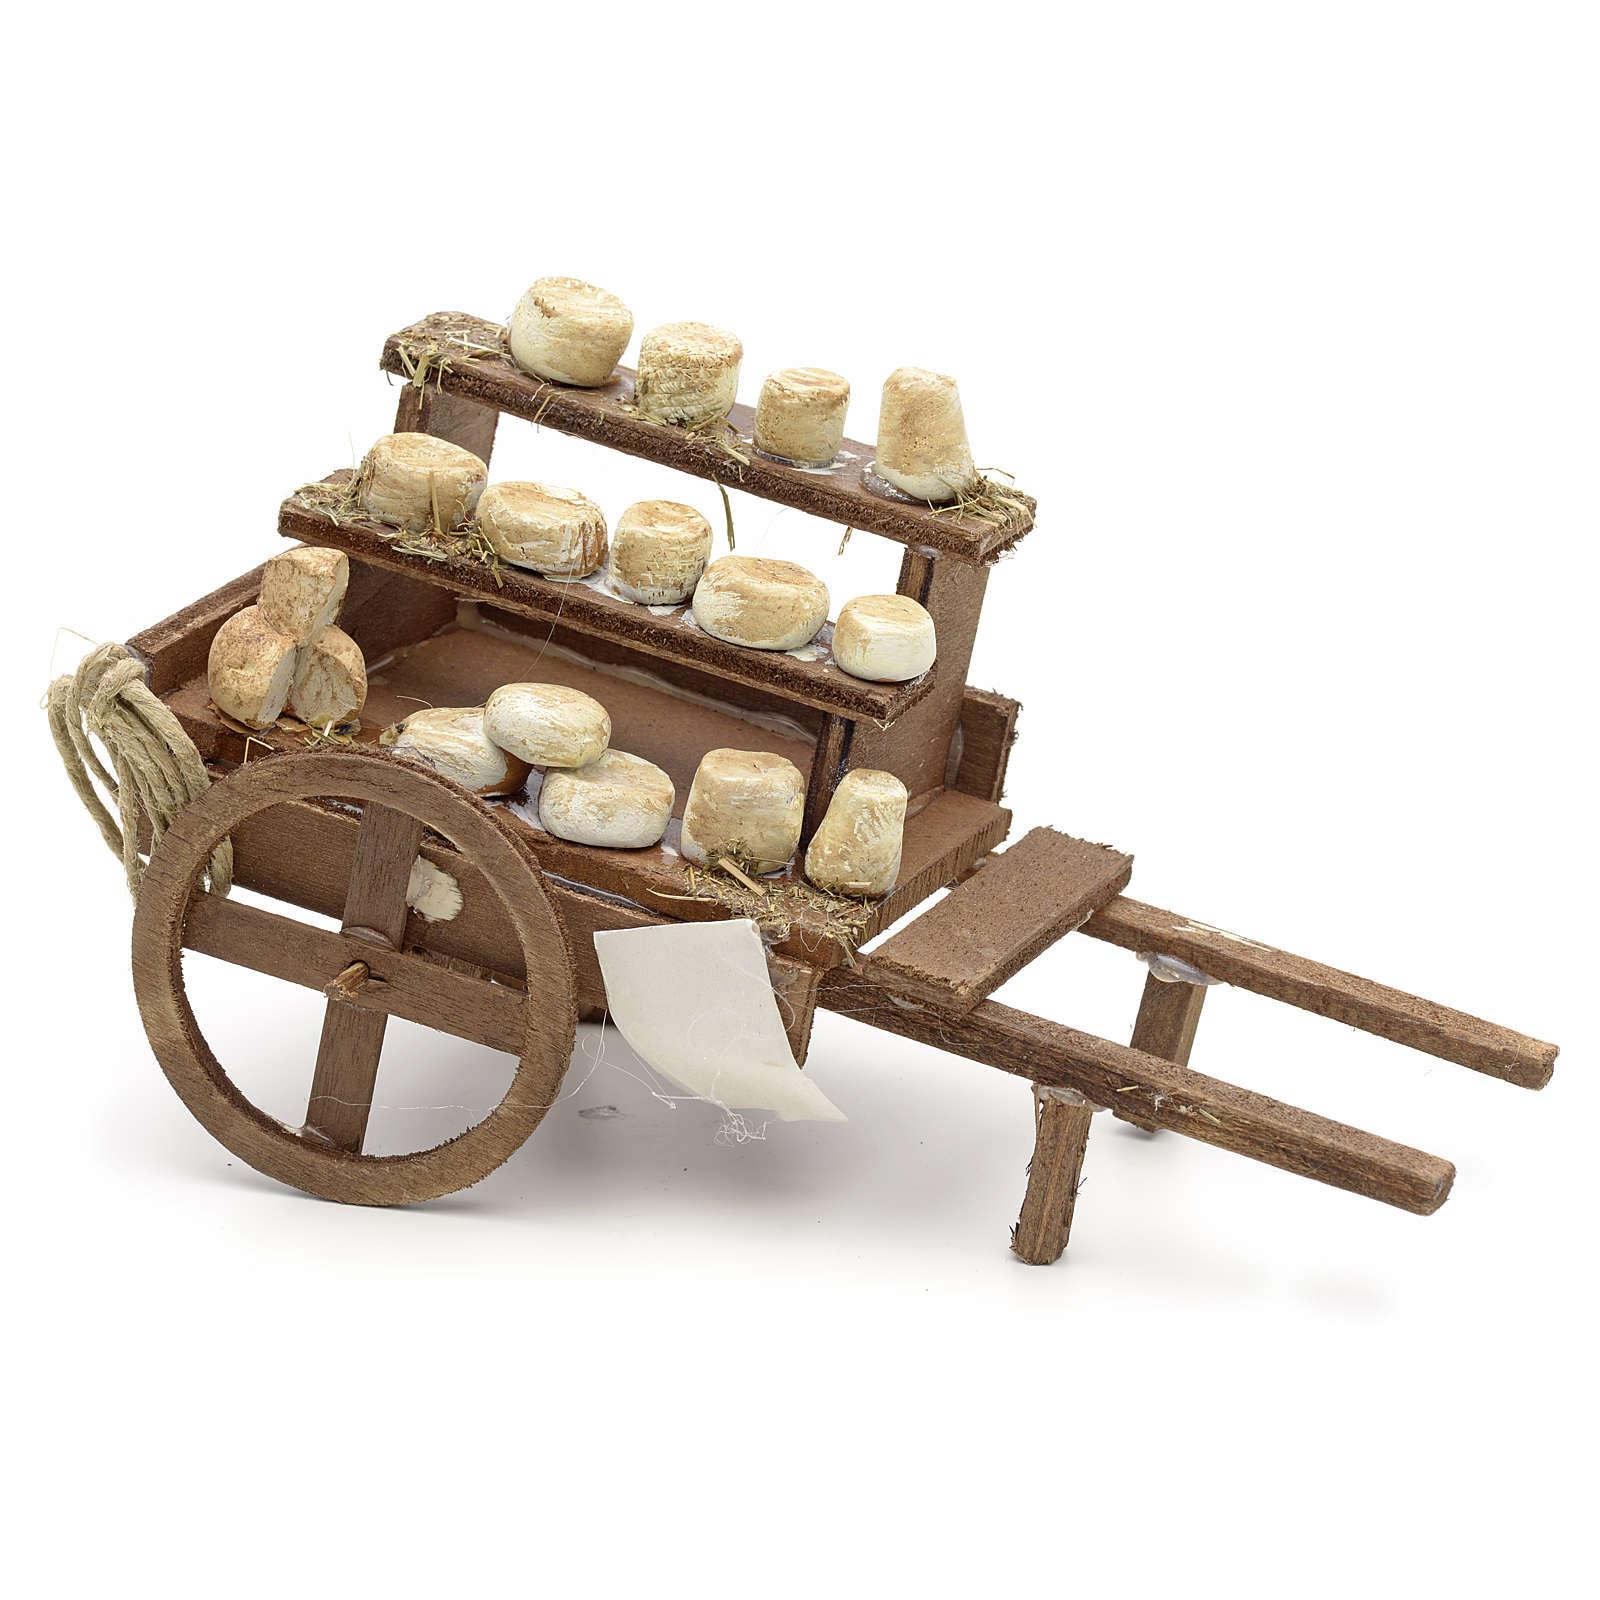 Carro formaggi presepe artigianale Napoli 4